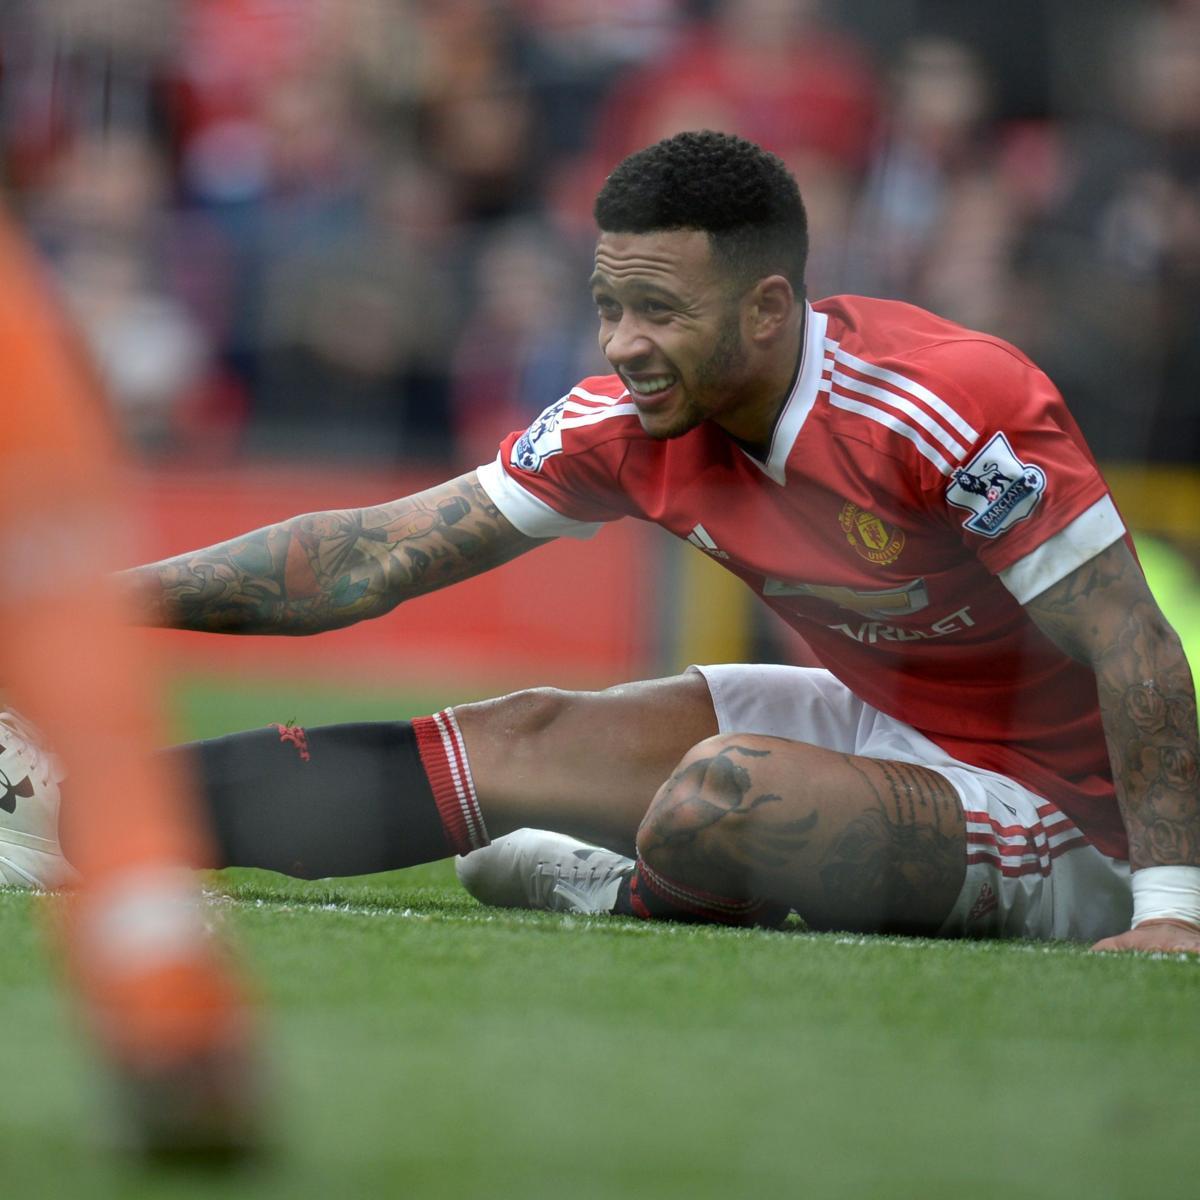 Manchester United Transfer News Latest Rumours On Lucas: Manchester United Transfer News: Latest Rumours On Memphis